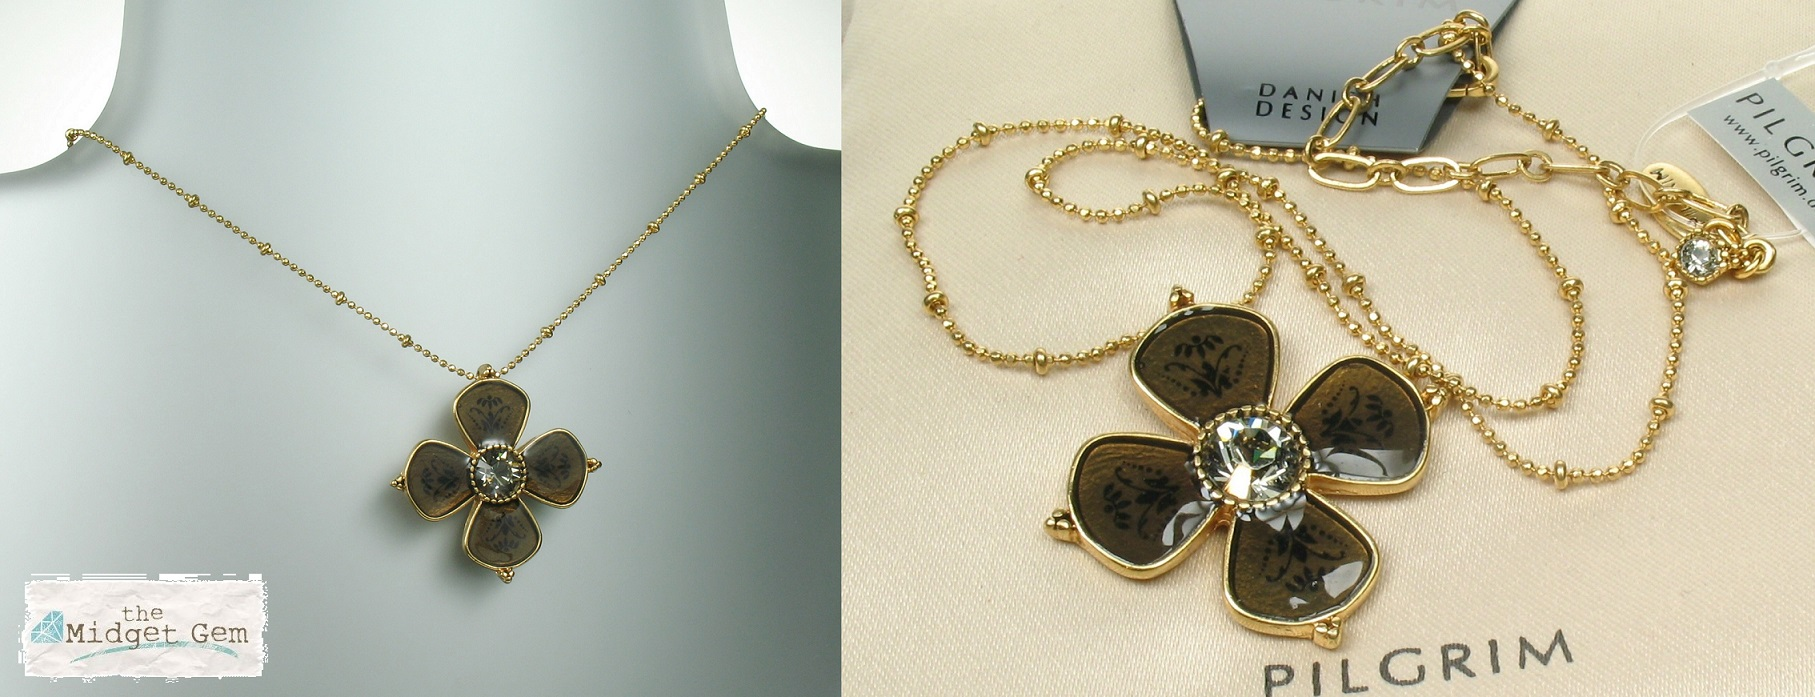 PILGRIM Necklace Devotion Flower Grey & Taupe Gold Plate BNWT